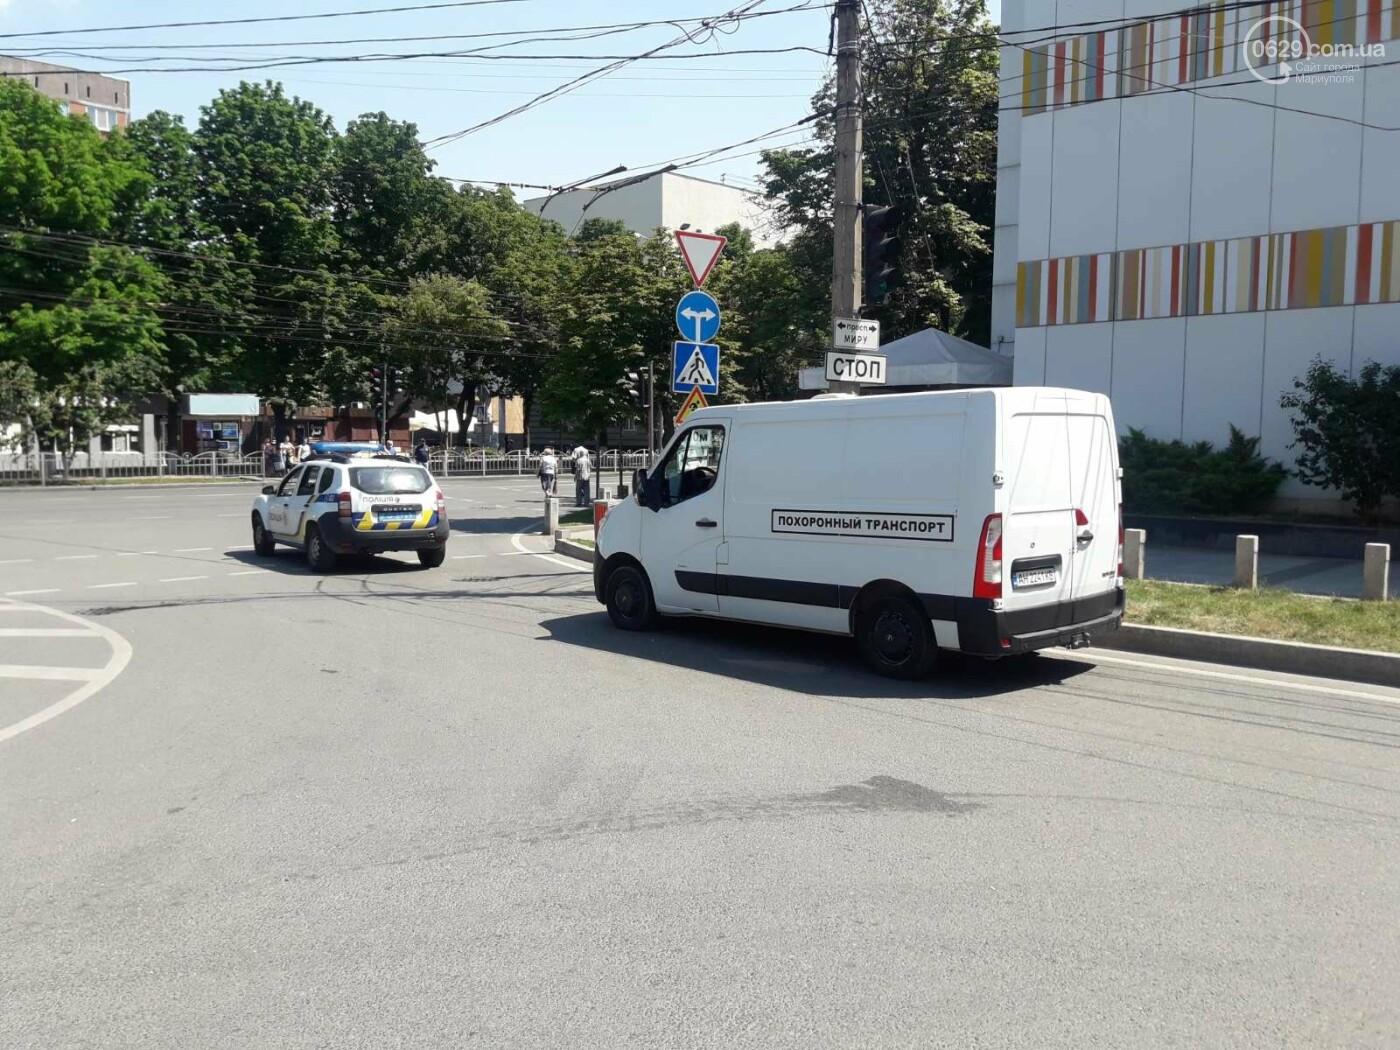 В центре Мариуполя внезапно умер мужчина, - ФОТО, фото-1